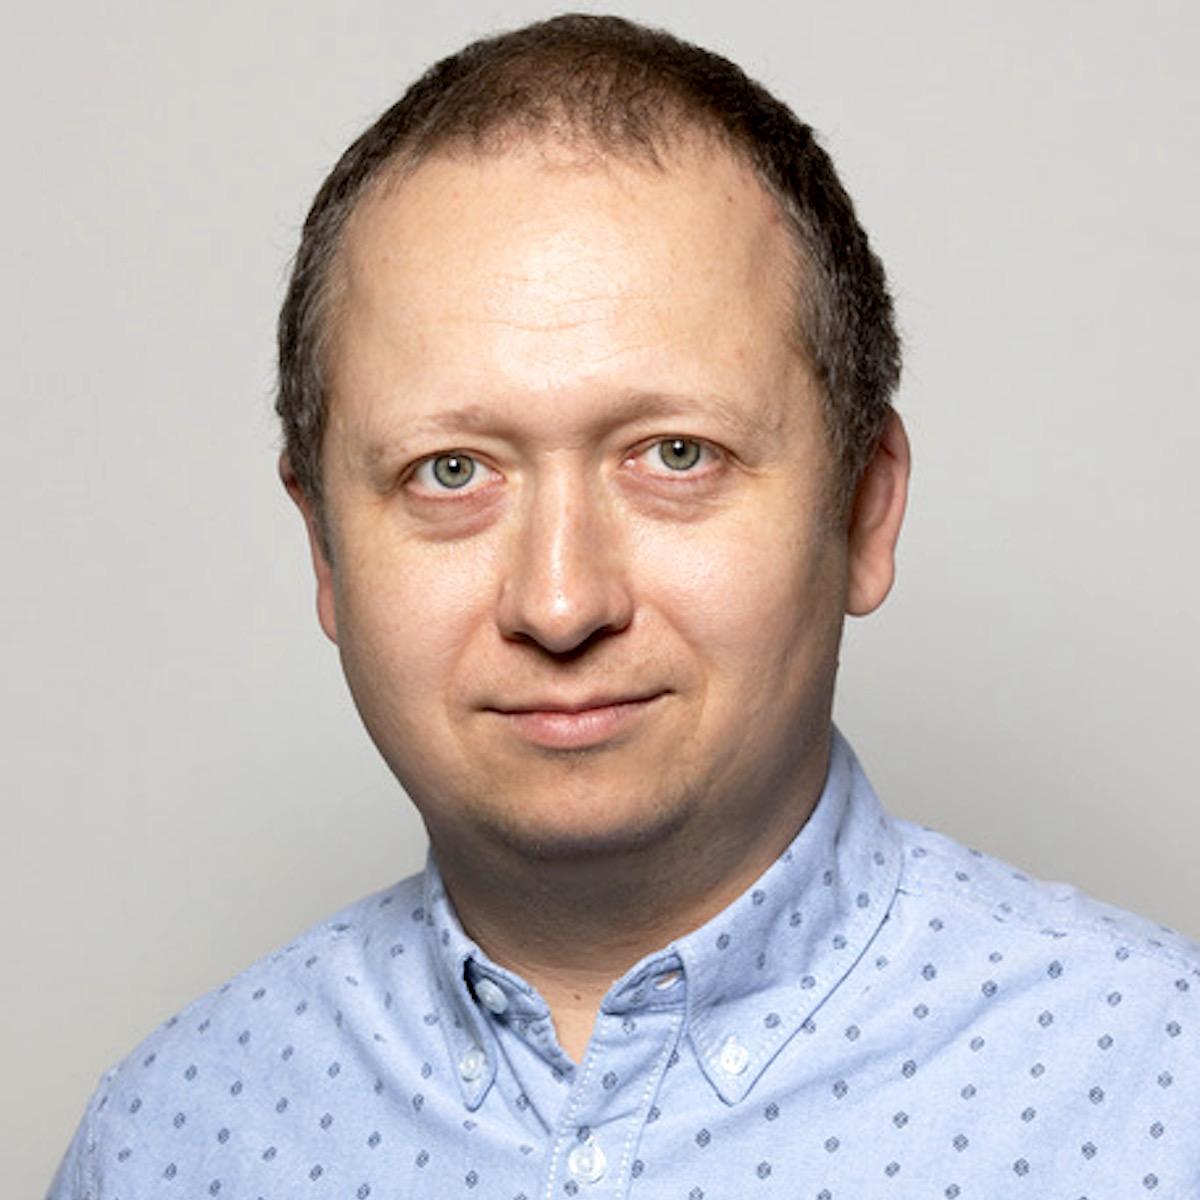 Daniel Novák